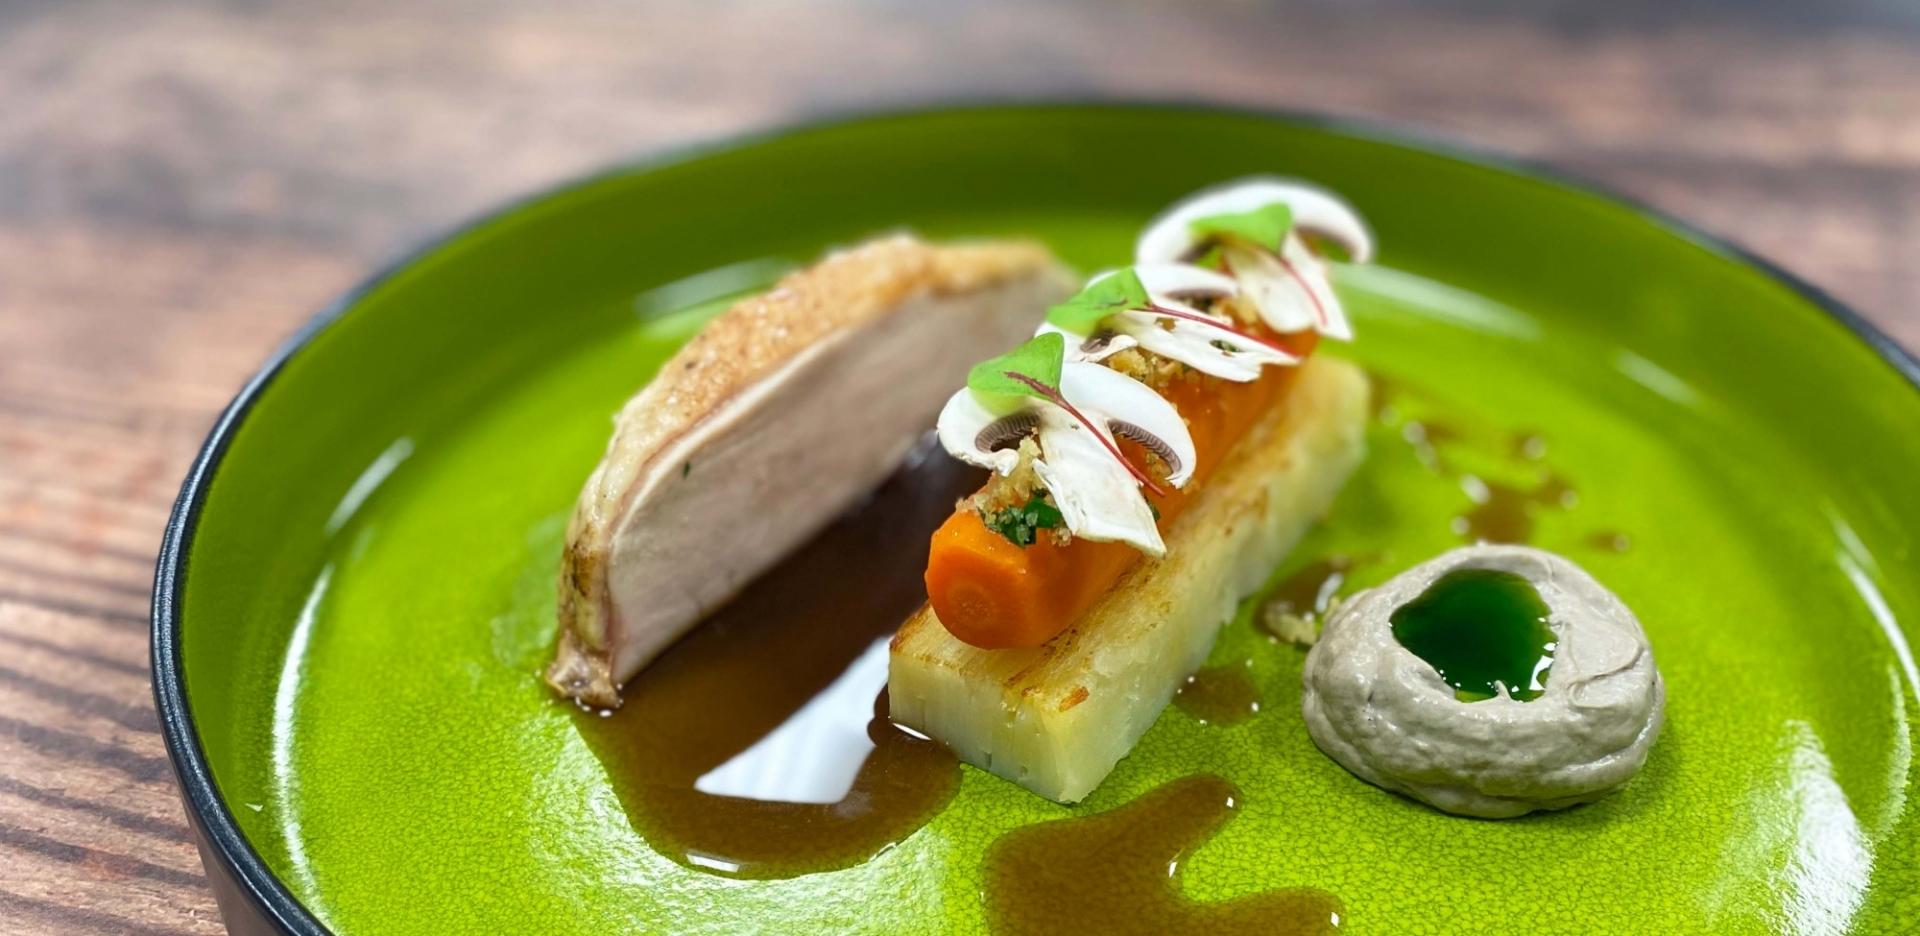 Sutton Hoo Chicken, Potato, Mushroom and Carrot